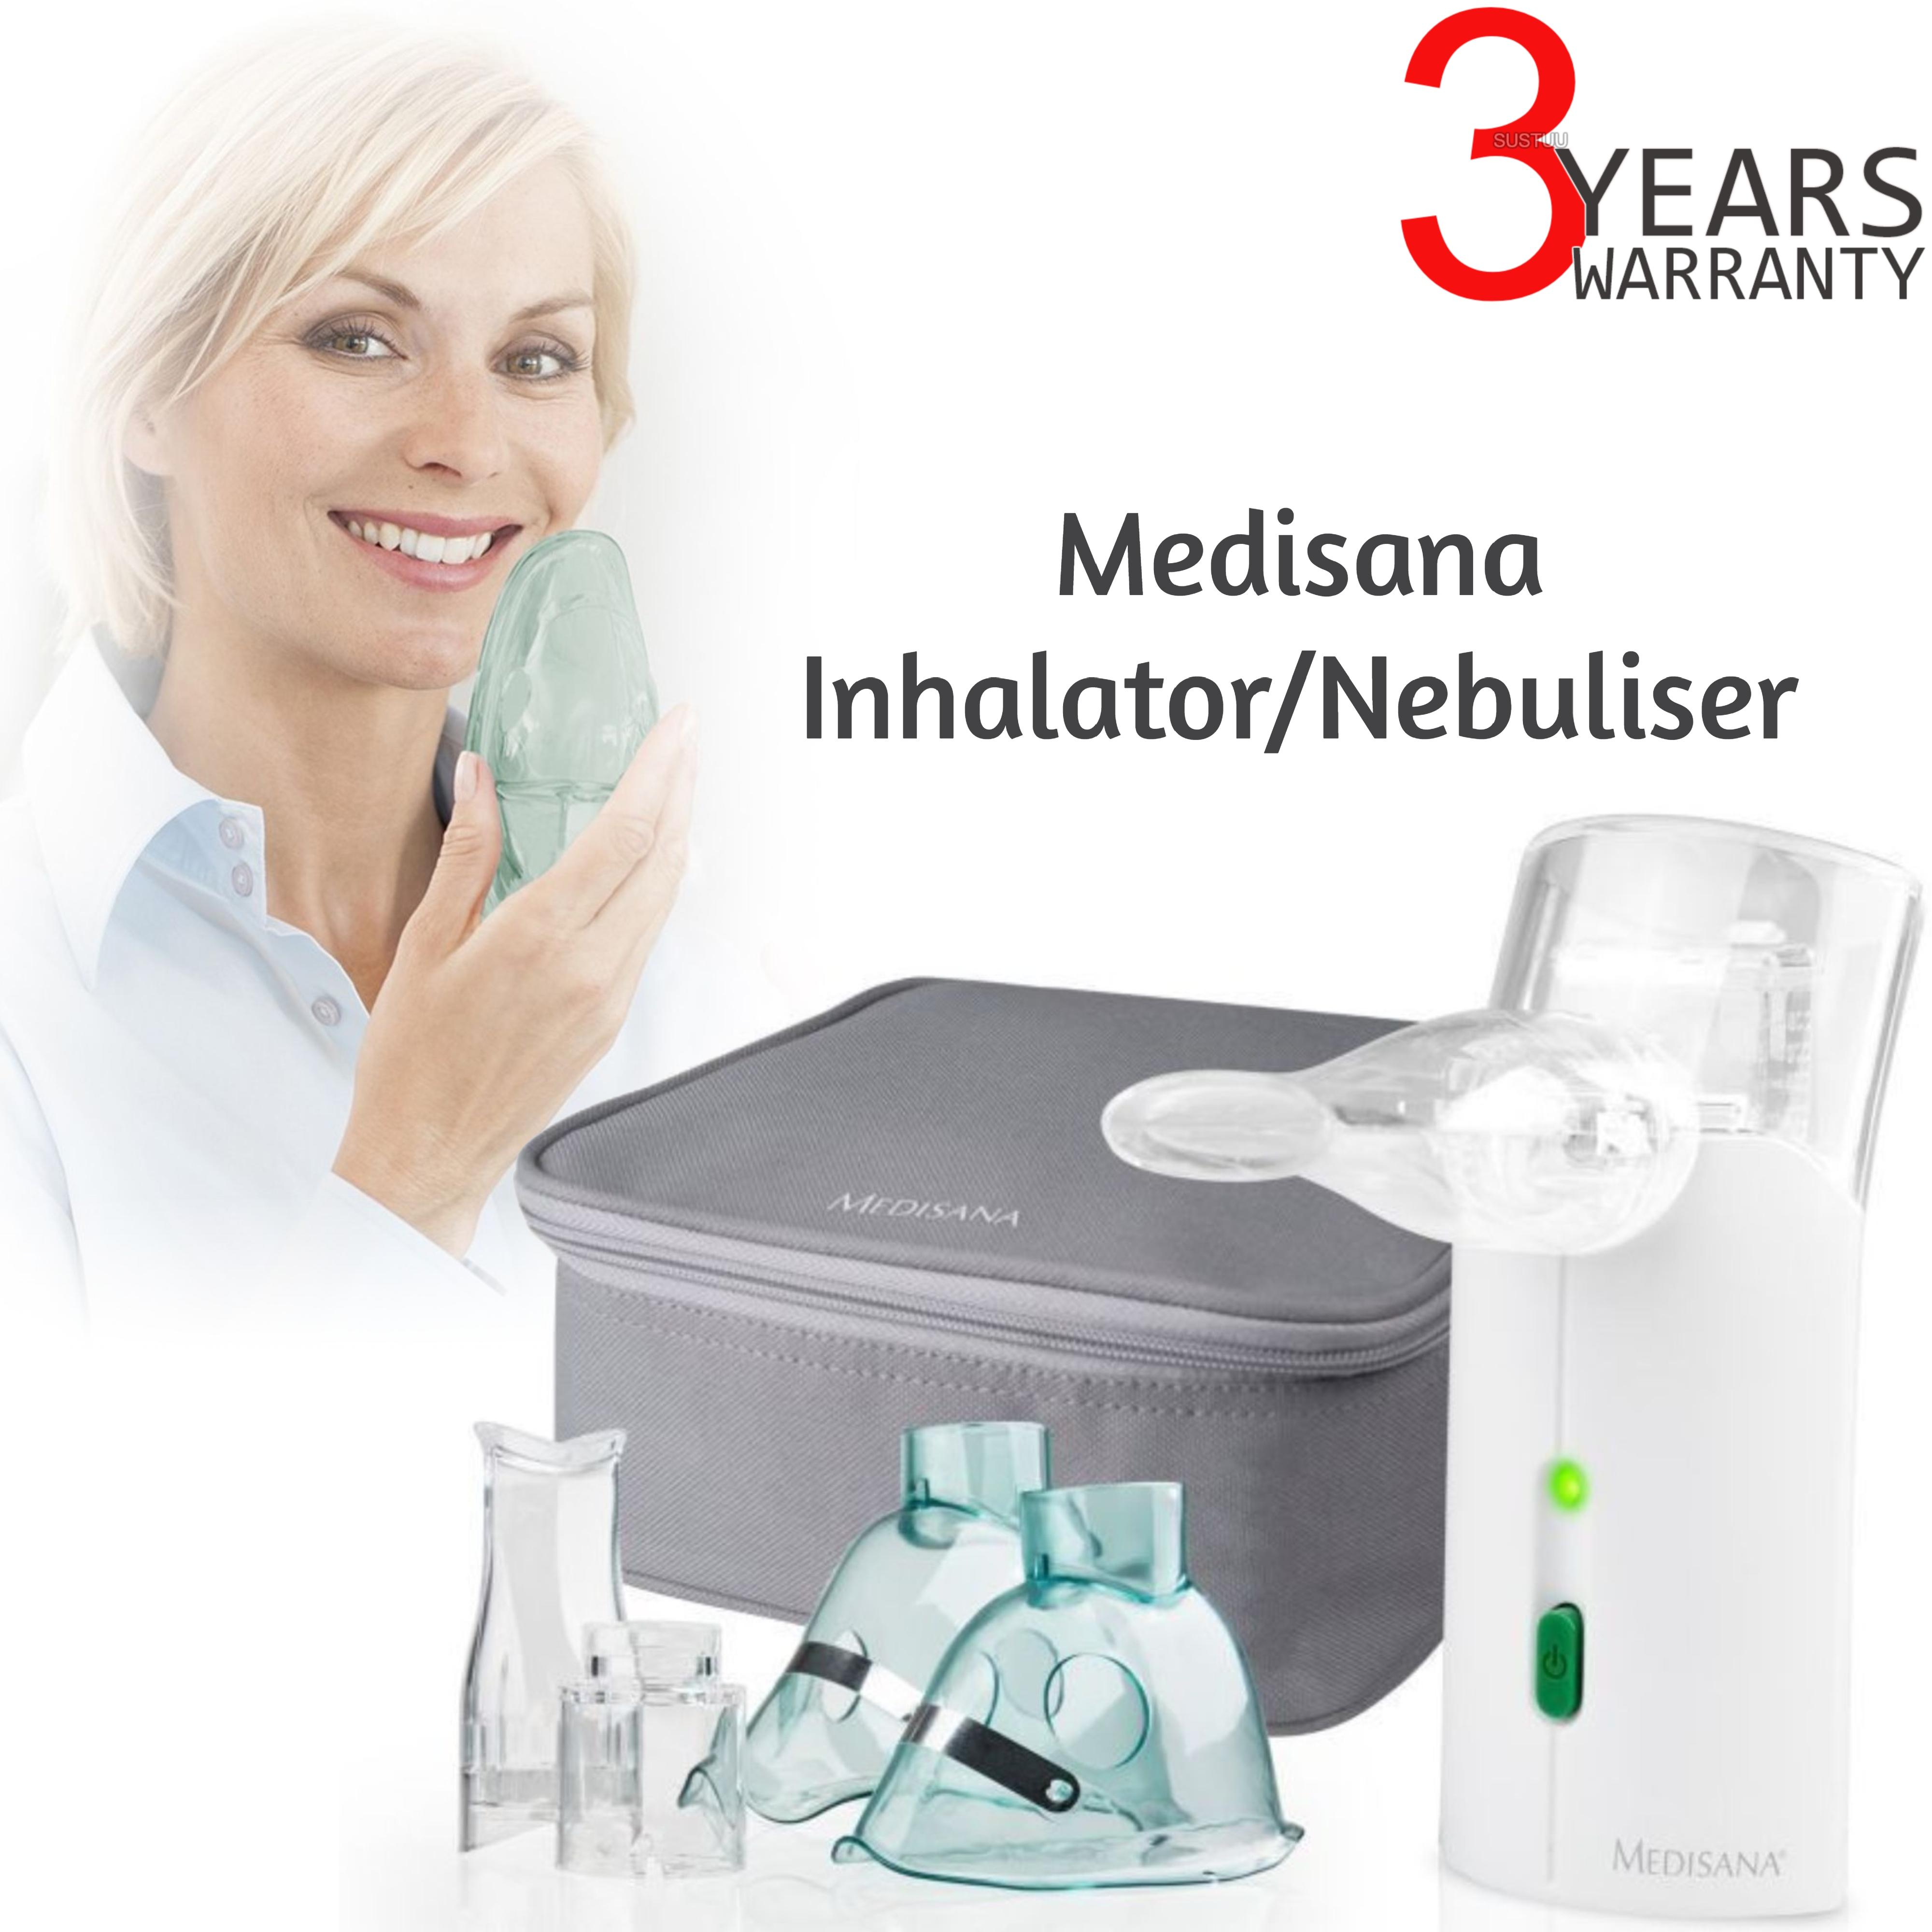 Medisana Ultrasonic Inhalator Nebuliser Mouthpiece Mask for Respiration MD54105